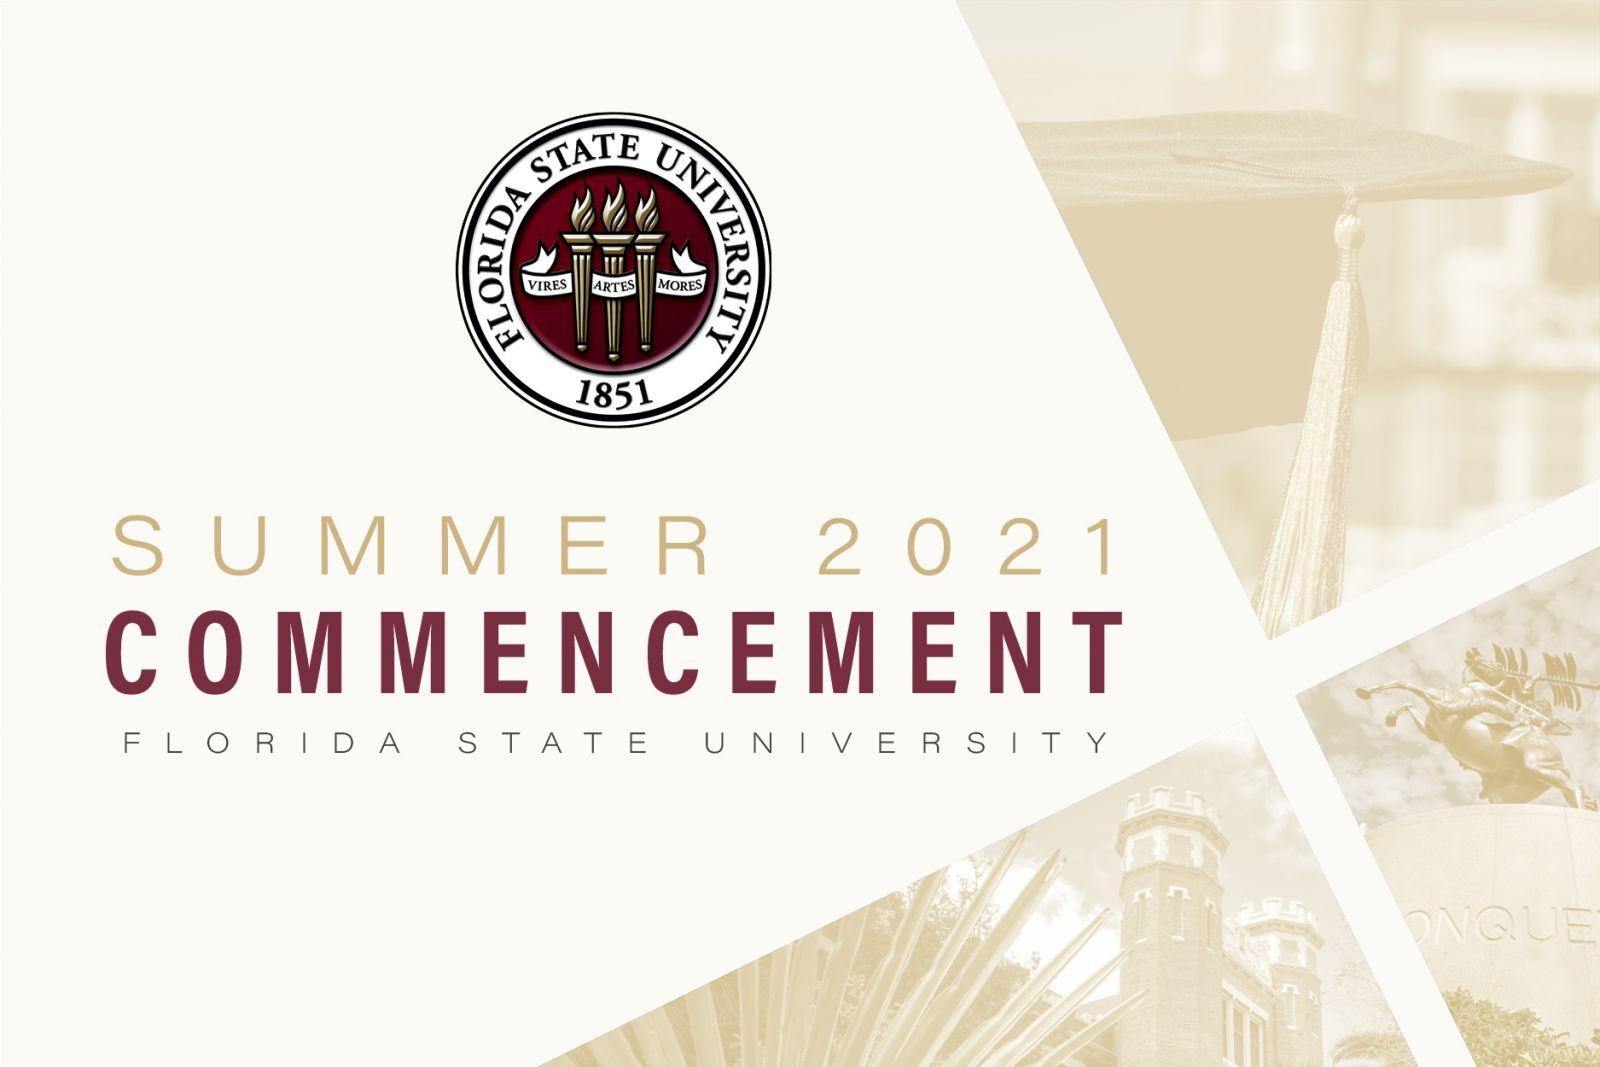 2021 Summer Commencement